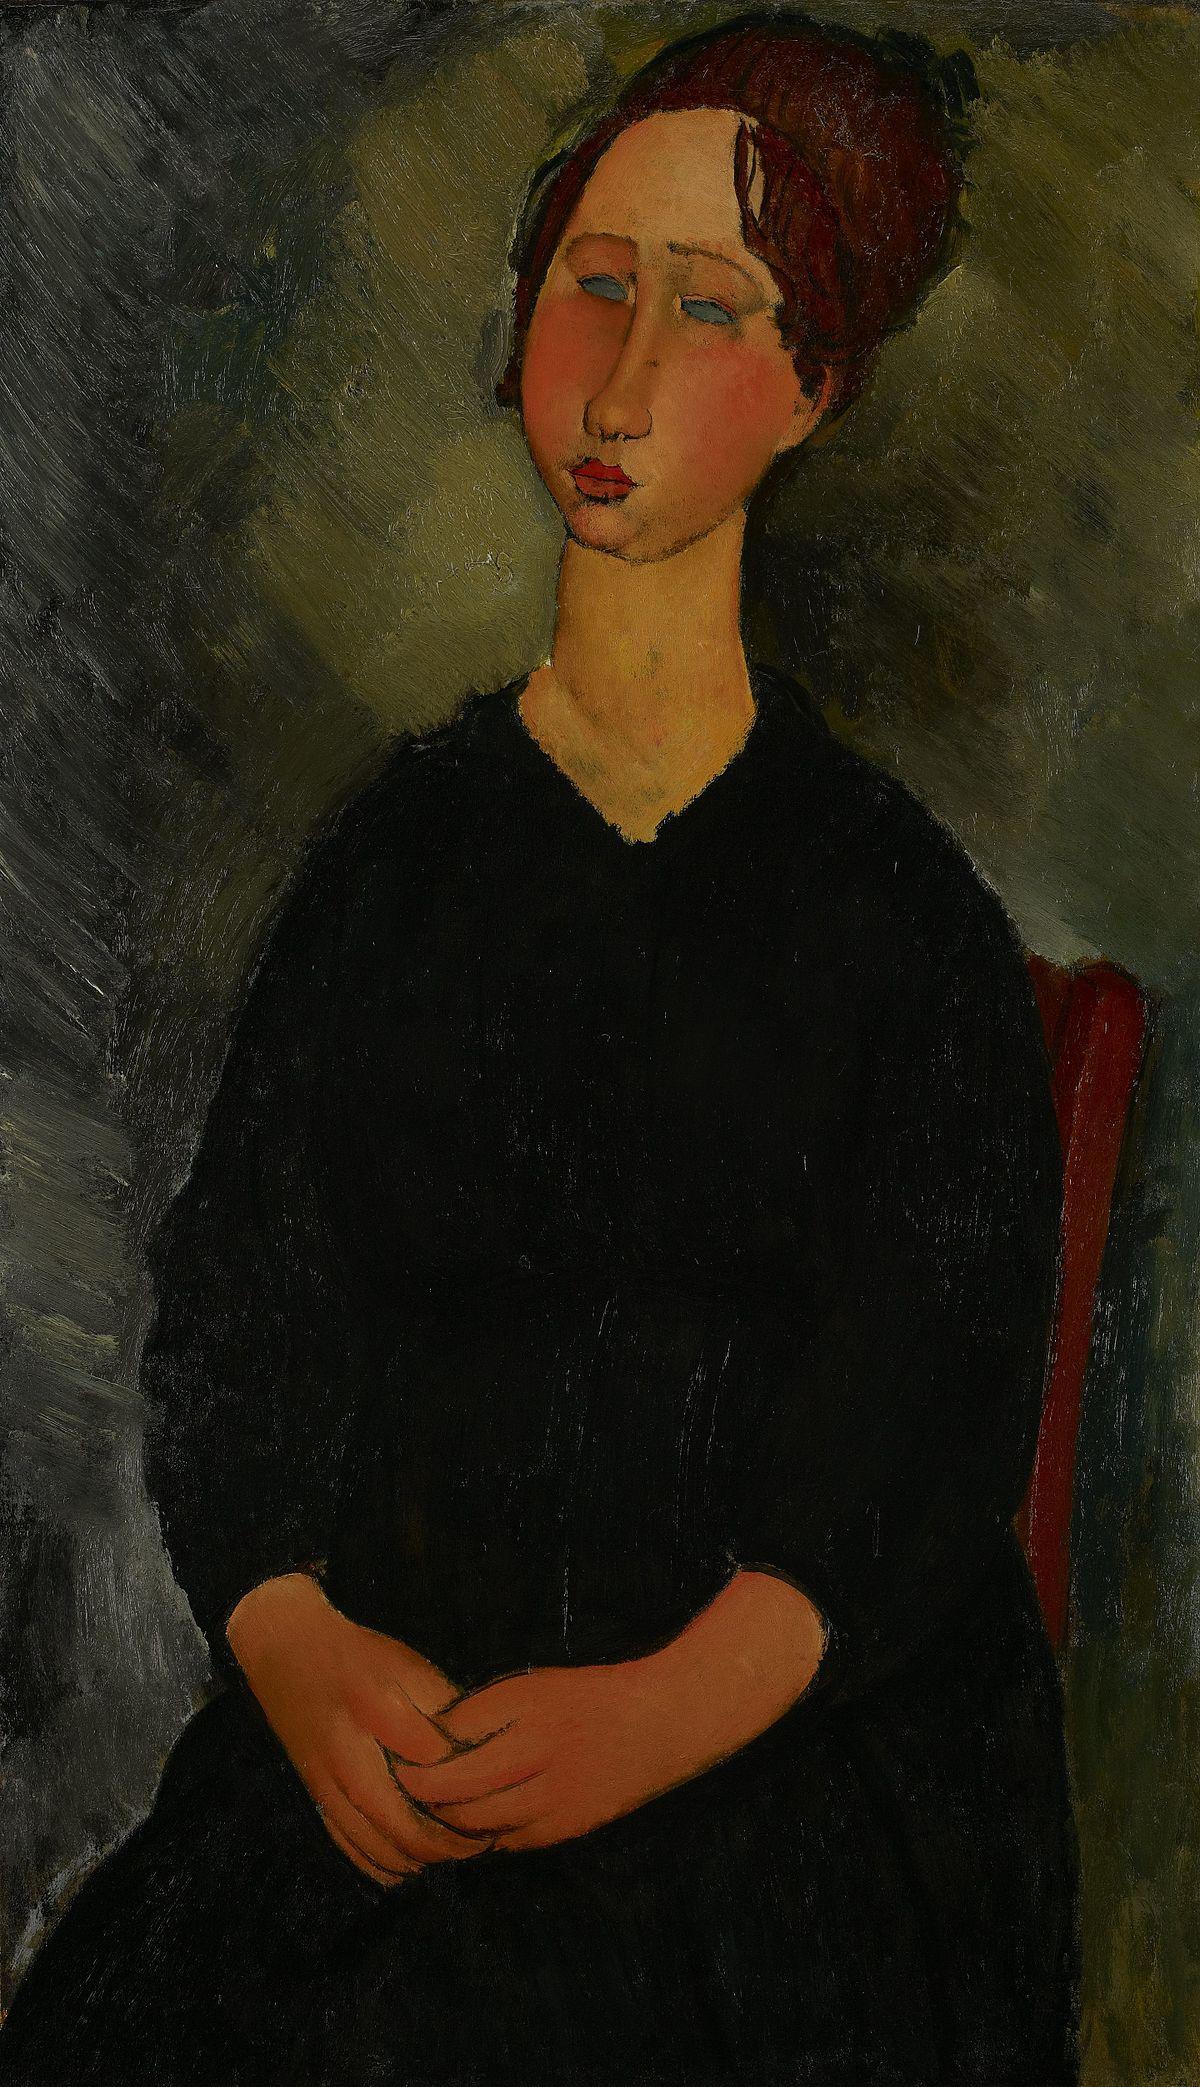 File:Amedeo Modigliani - Little Servant Girl - 59.30 - Minneapolis  Institute of Arts.jpg - Wikimedia Commons